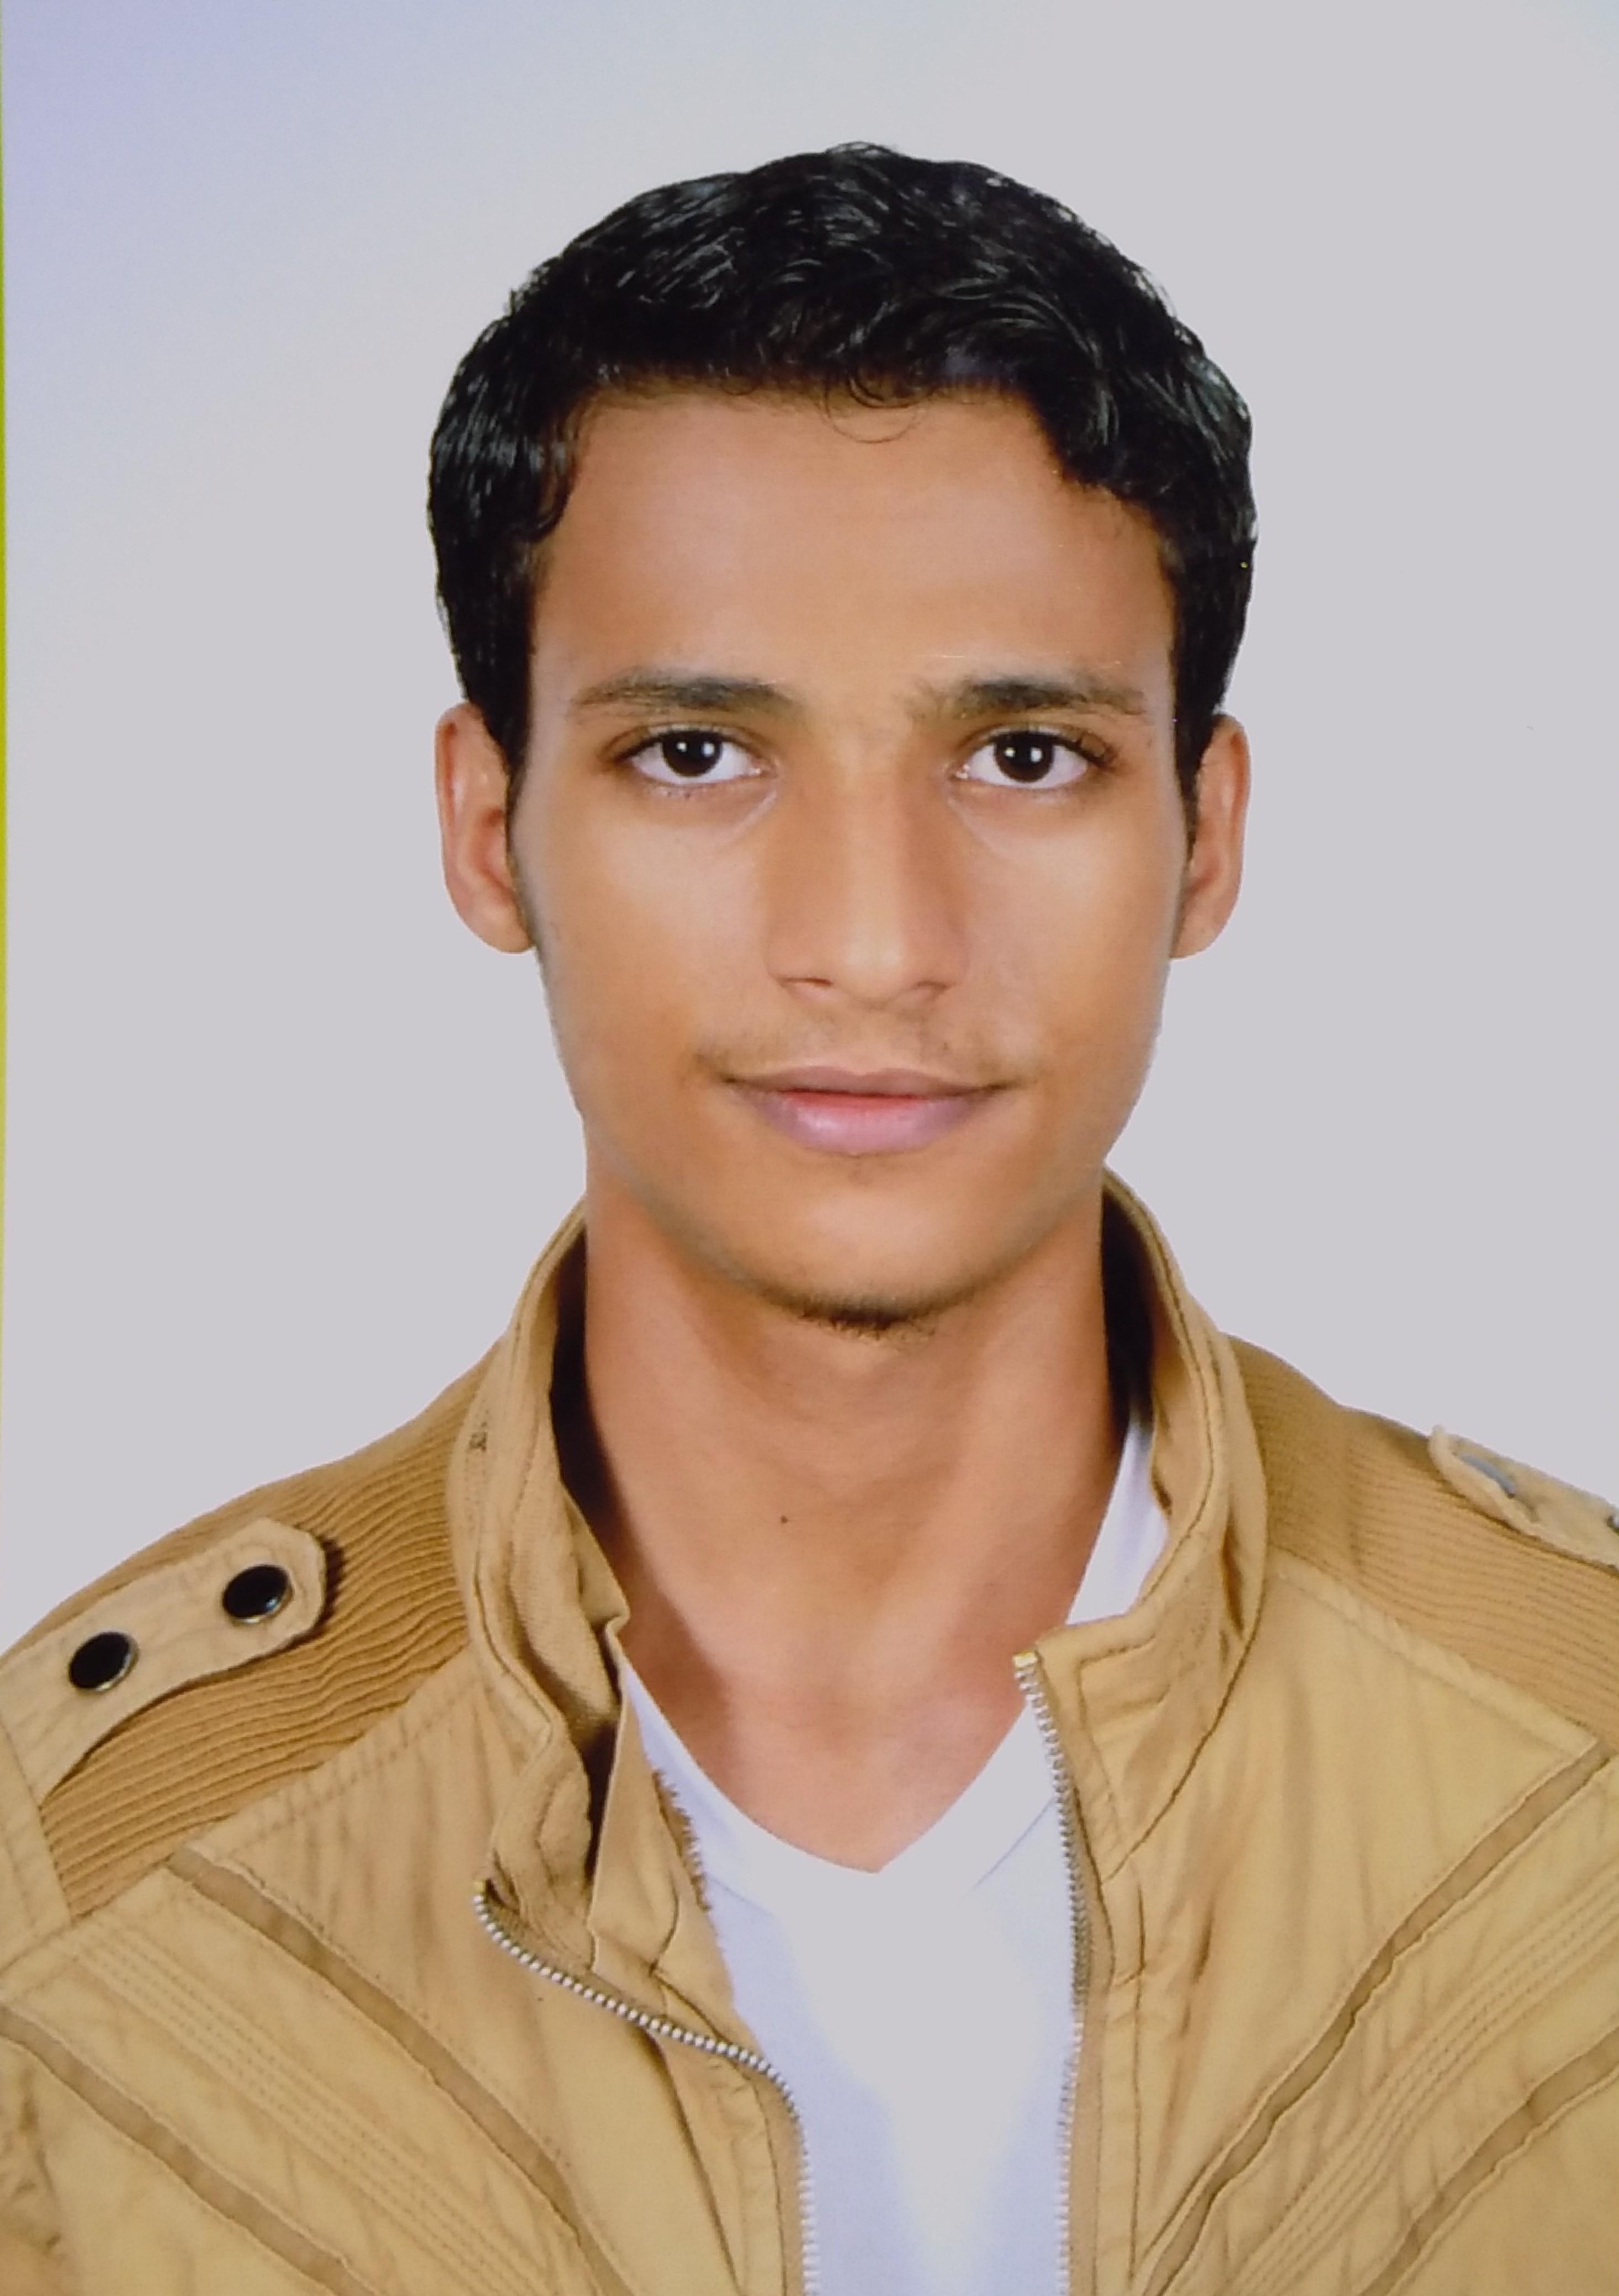 azzamalosaby2 Profile Picture